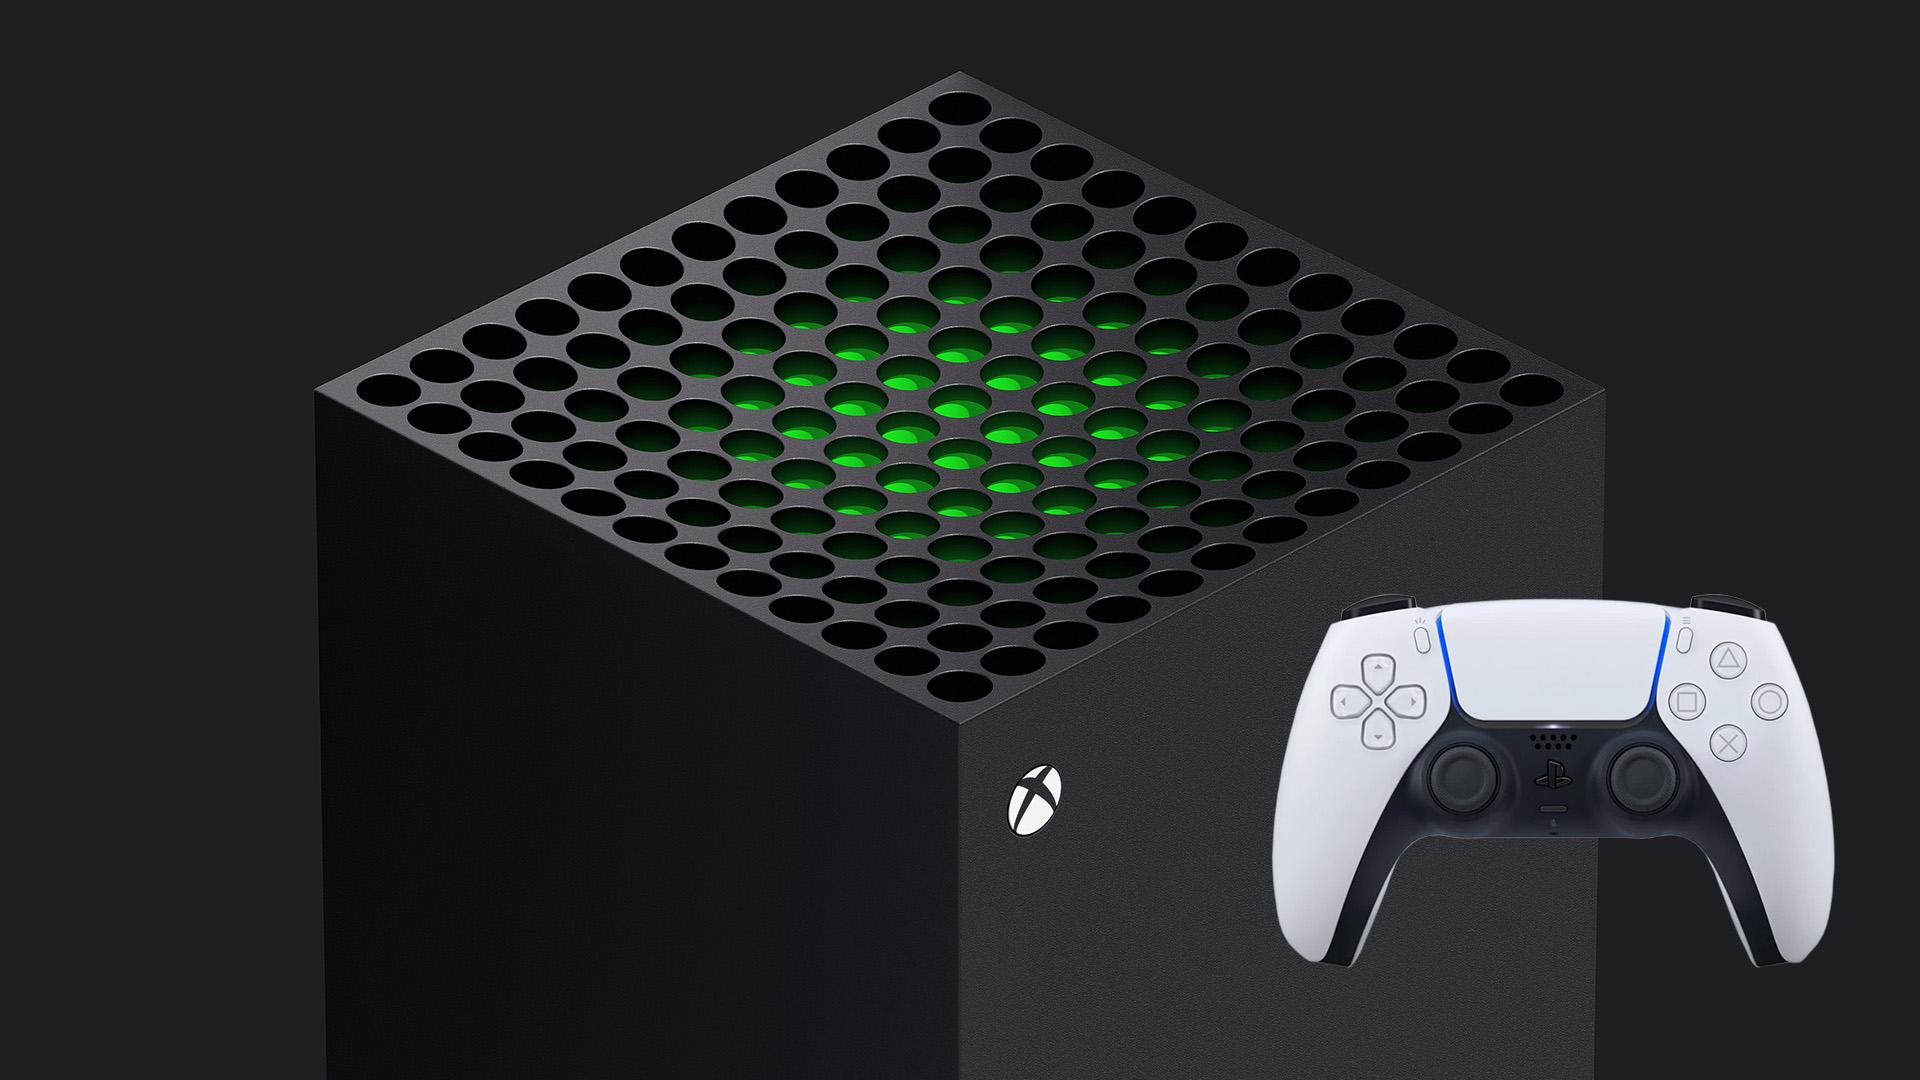 Xbox pregunta a jugadores sobre DualSense de PS5 y si quieren un control así para Xbox Series X, GamersRd